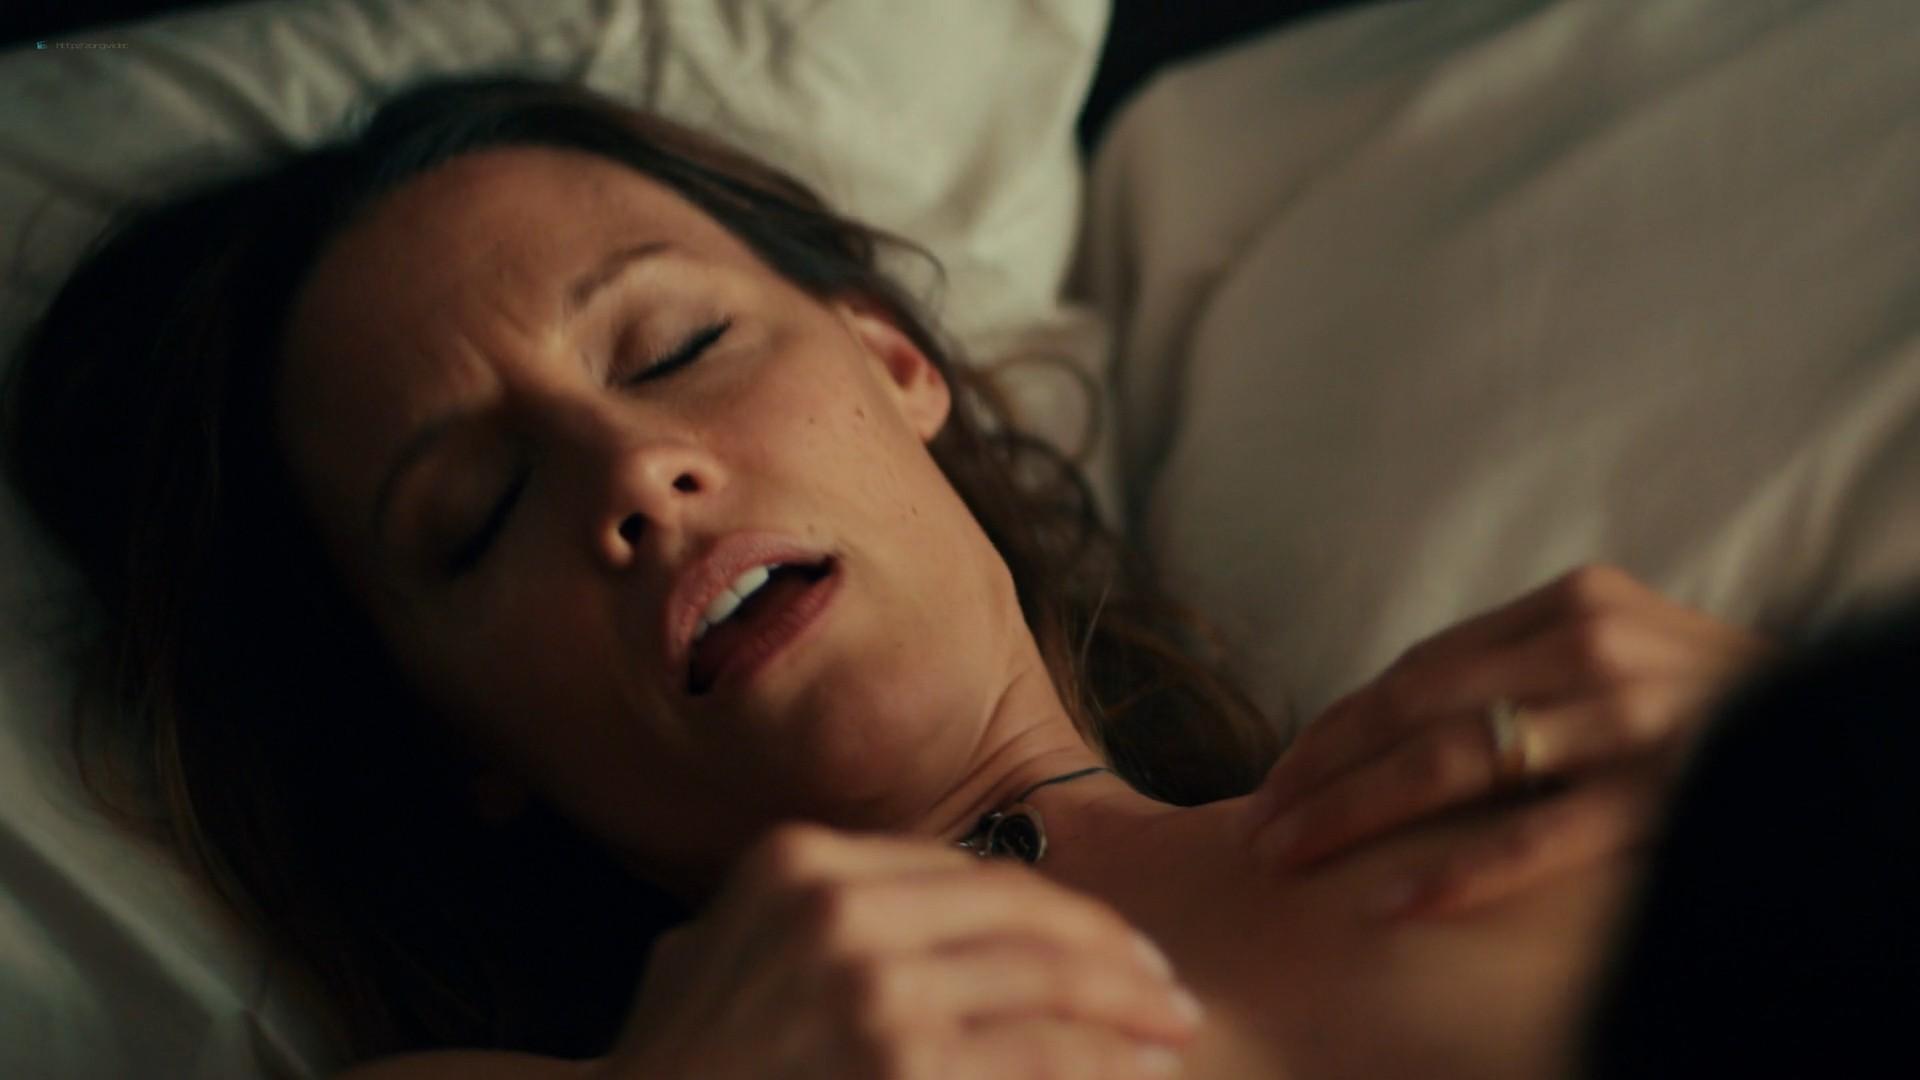 Emmanuelle Chriqui lesbian sex with KaDee Strickland nude topless - Shut Eye (2016) s1e1 1080p (7)